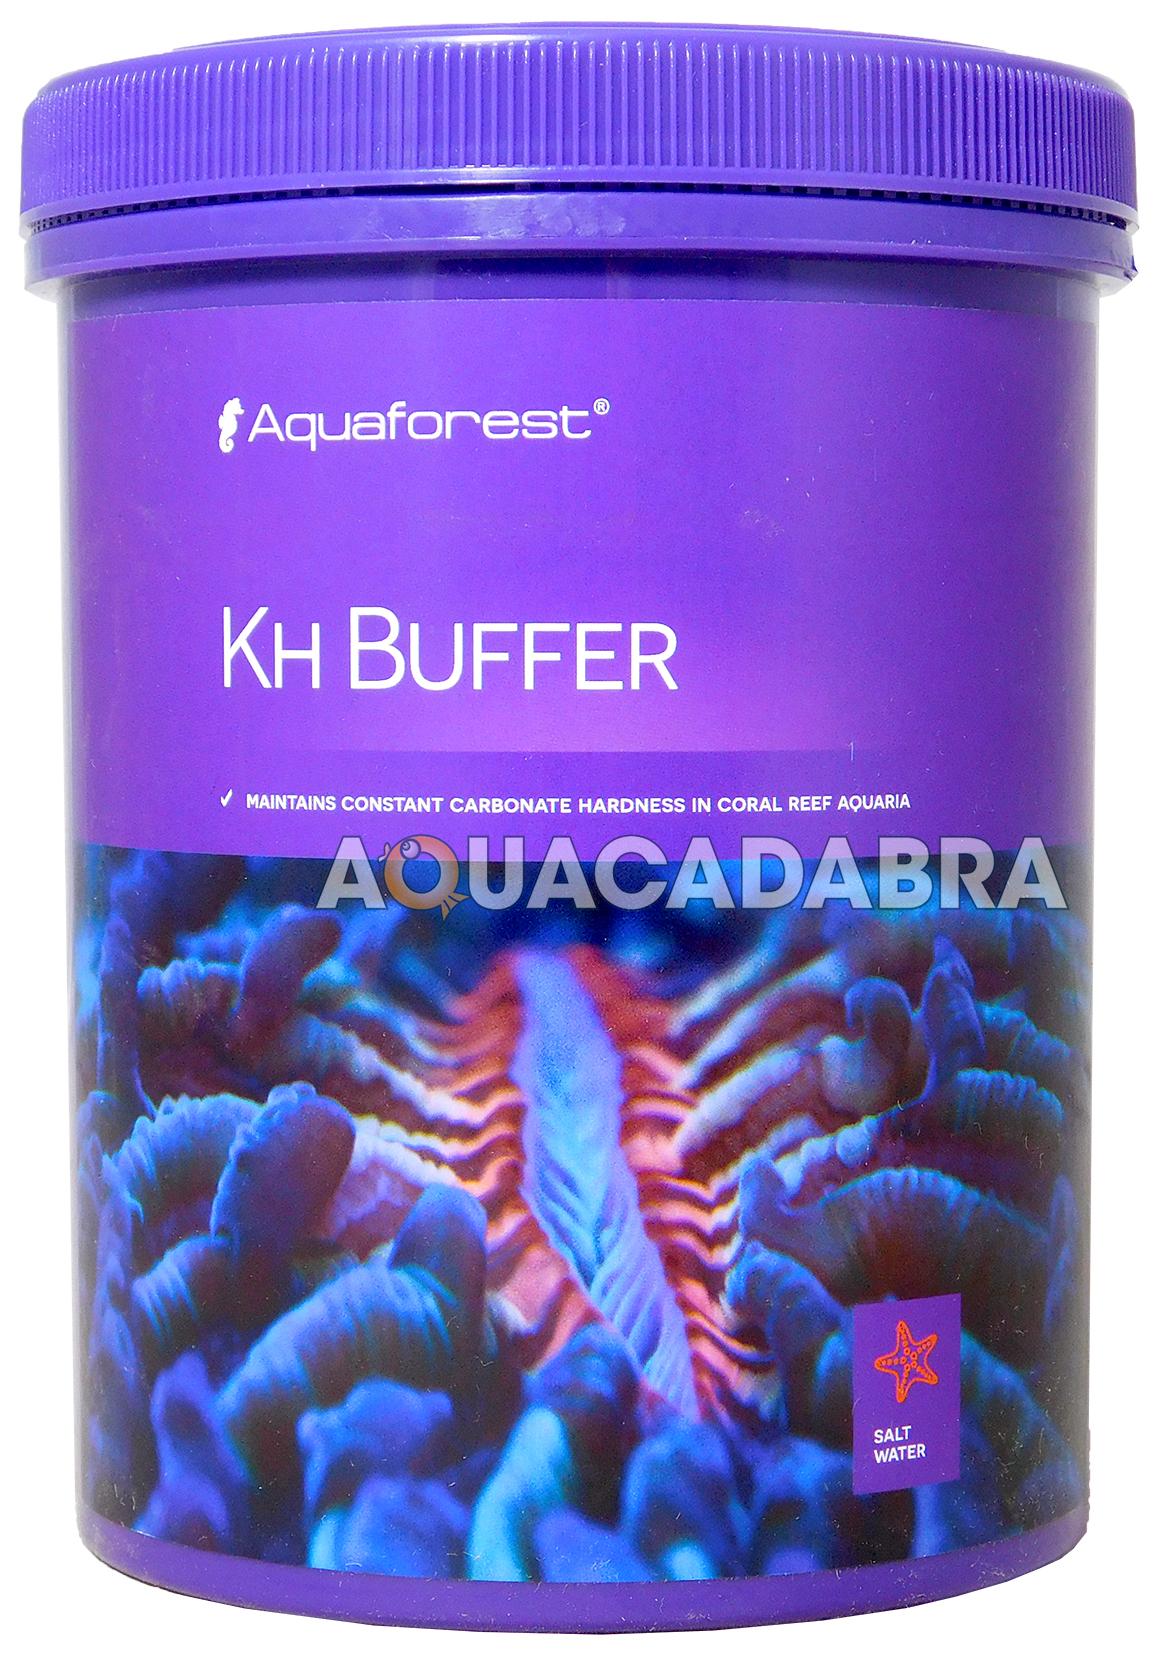 Aquaforest Kh Buffer 1 2kg Maintains Carbonate Hardness